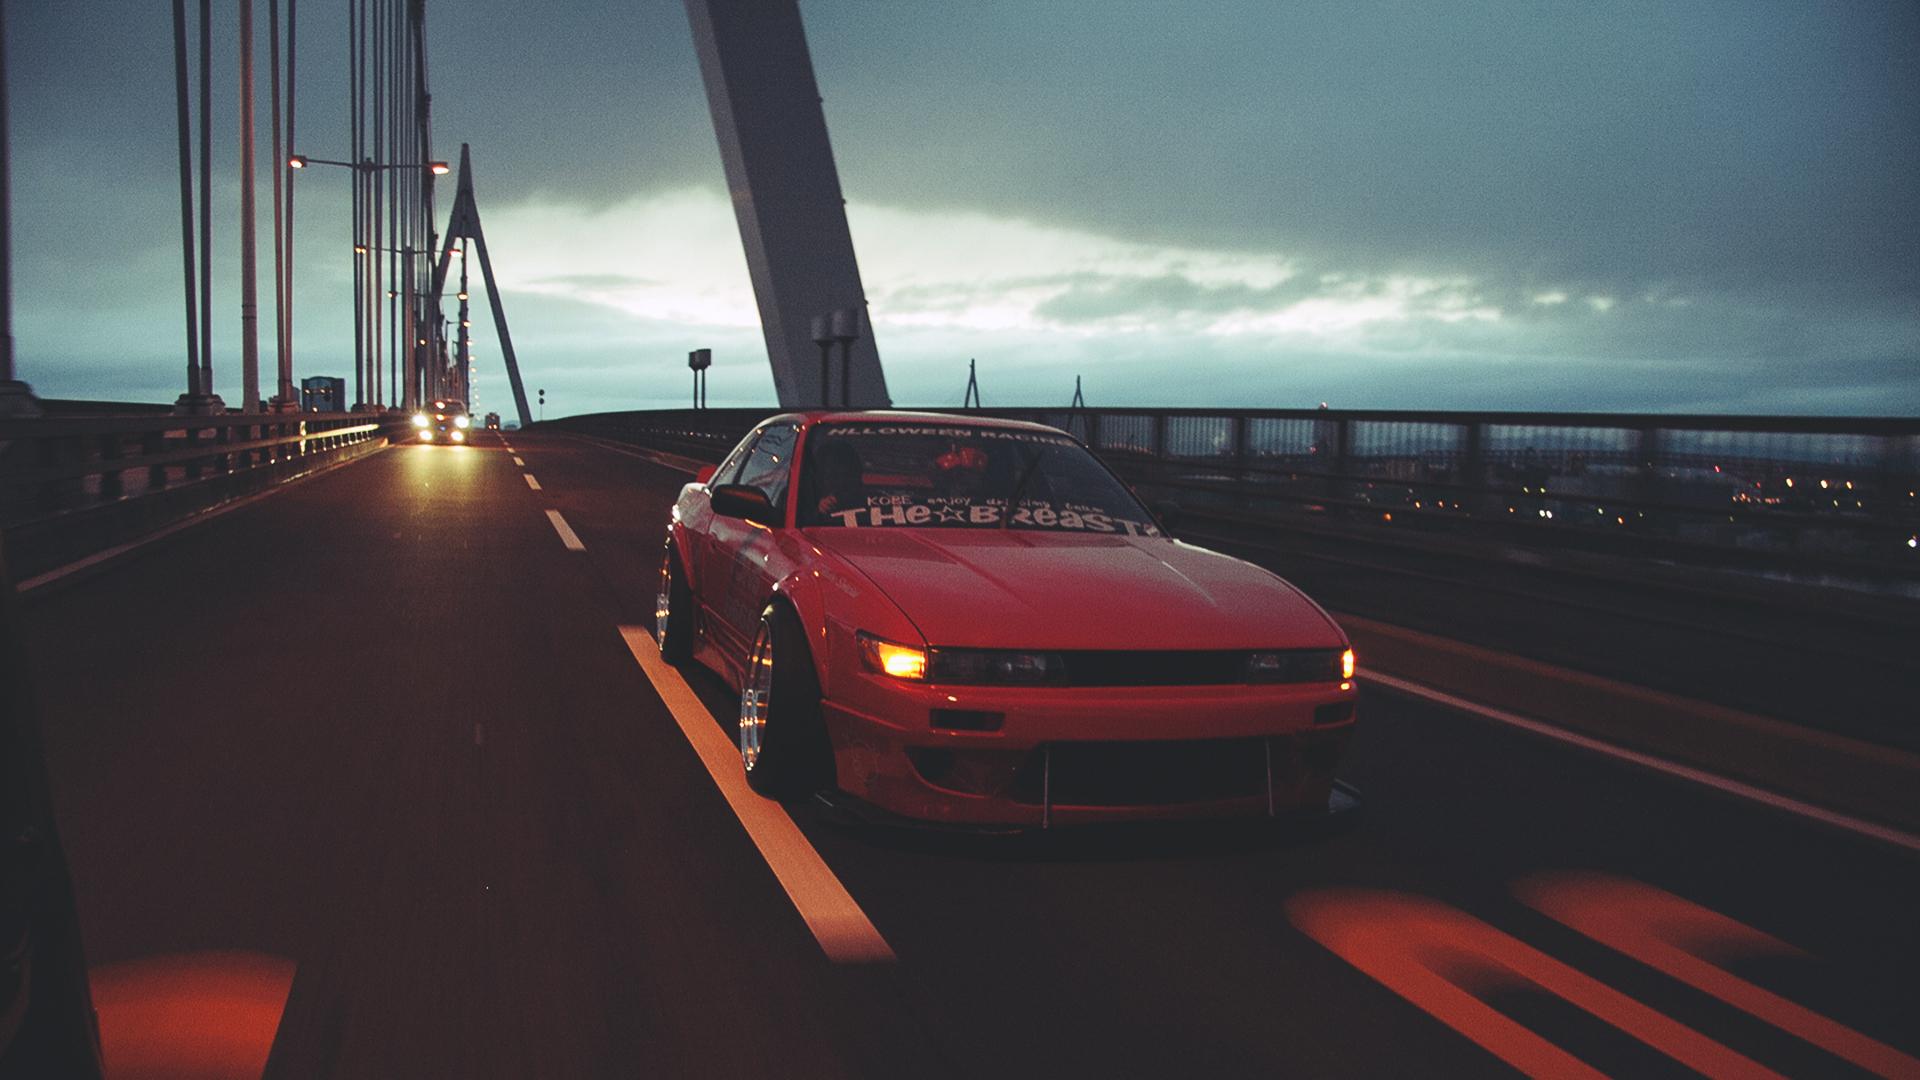 Japanese car wallpaper